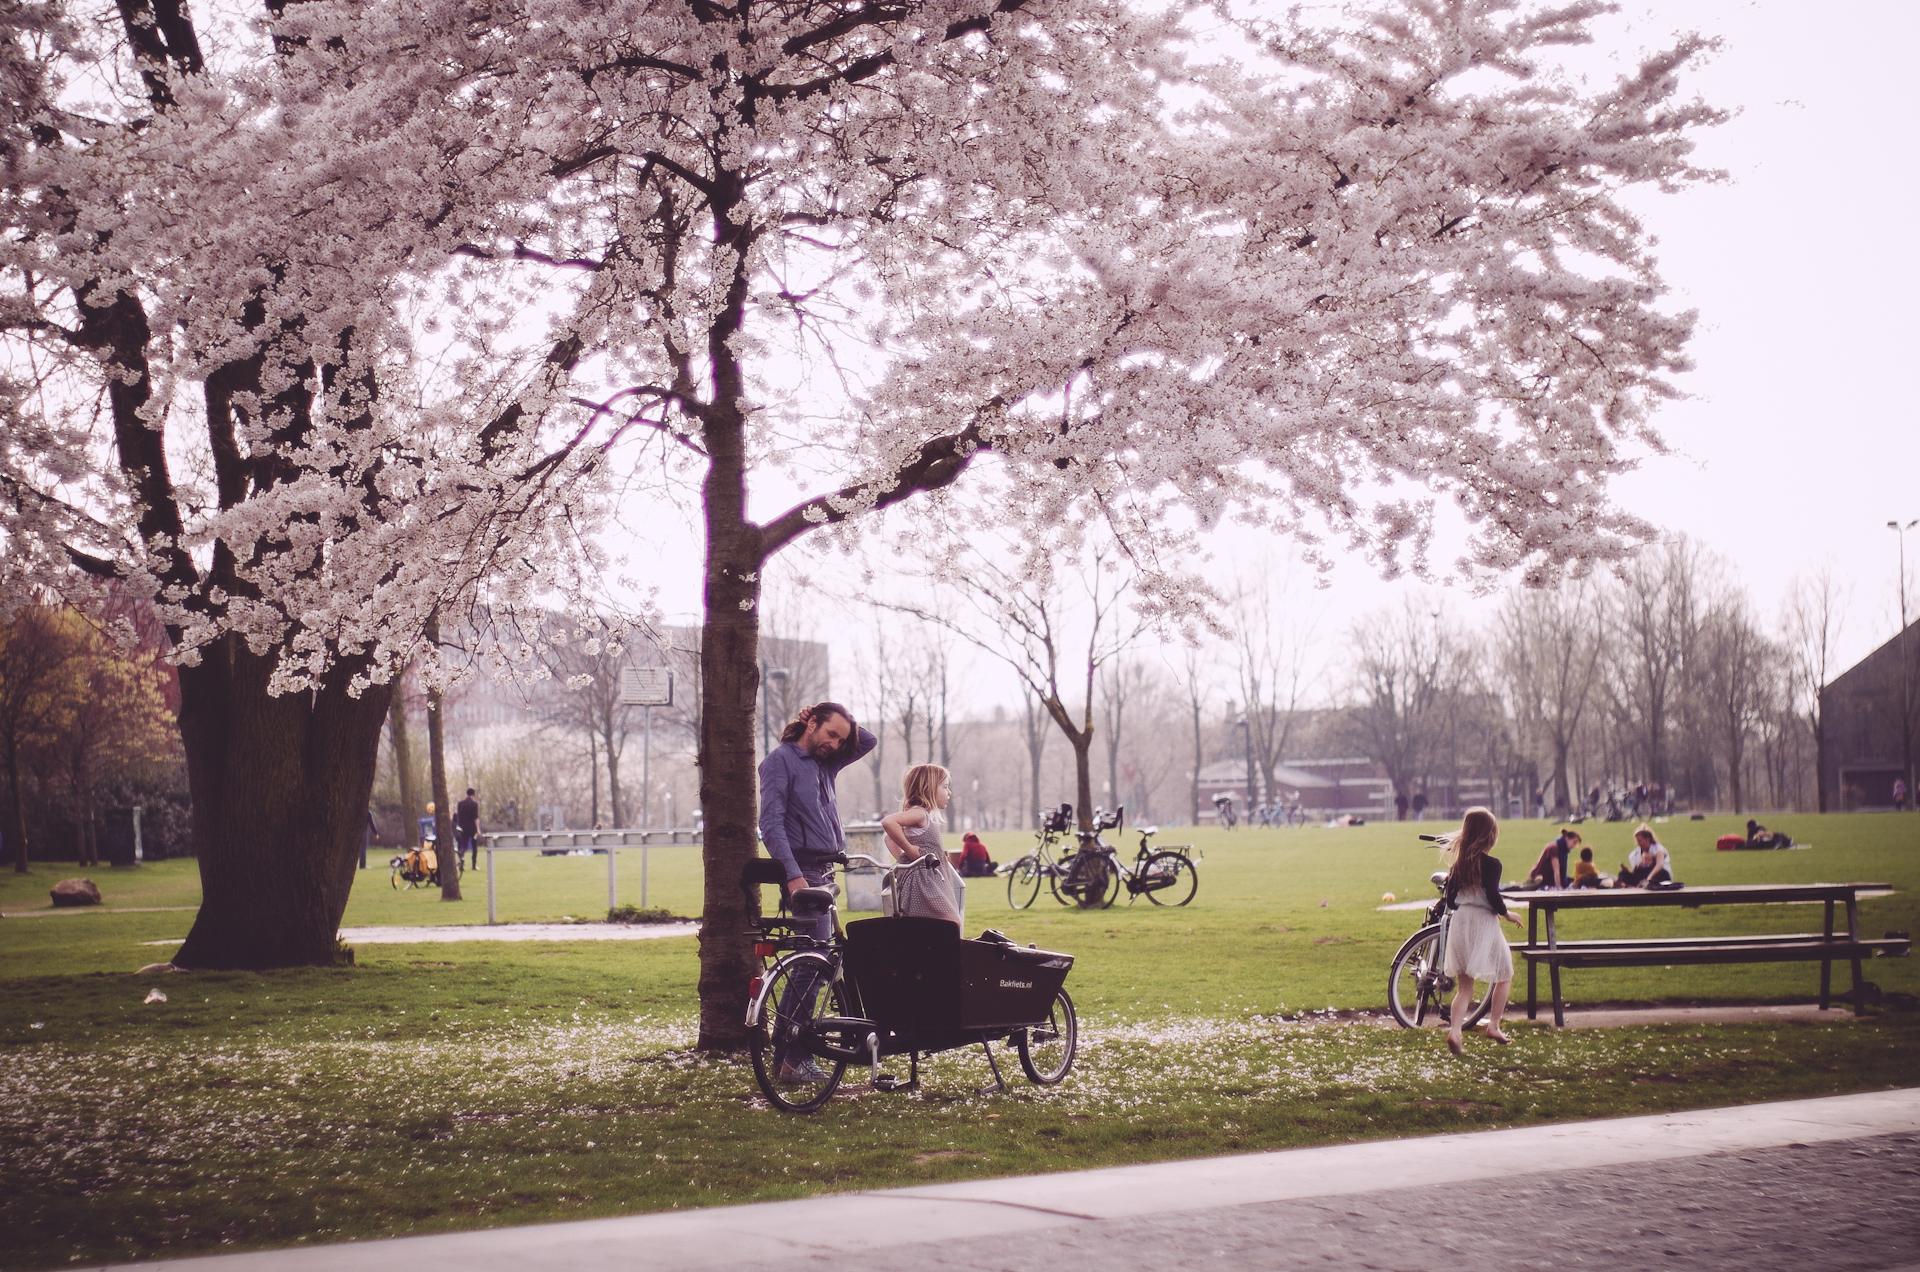 2018 APR Amsterdam Cherry Blossom Pink le-14.jpg